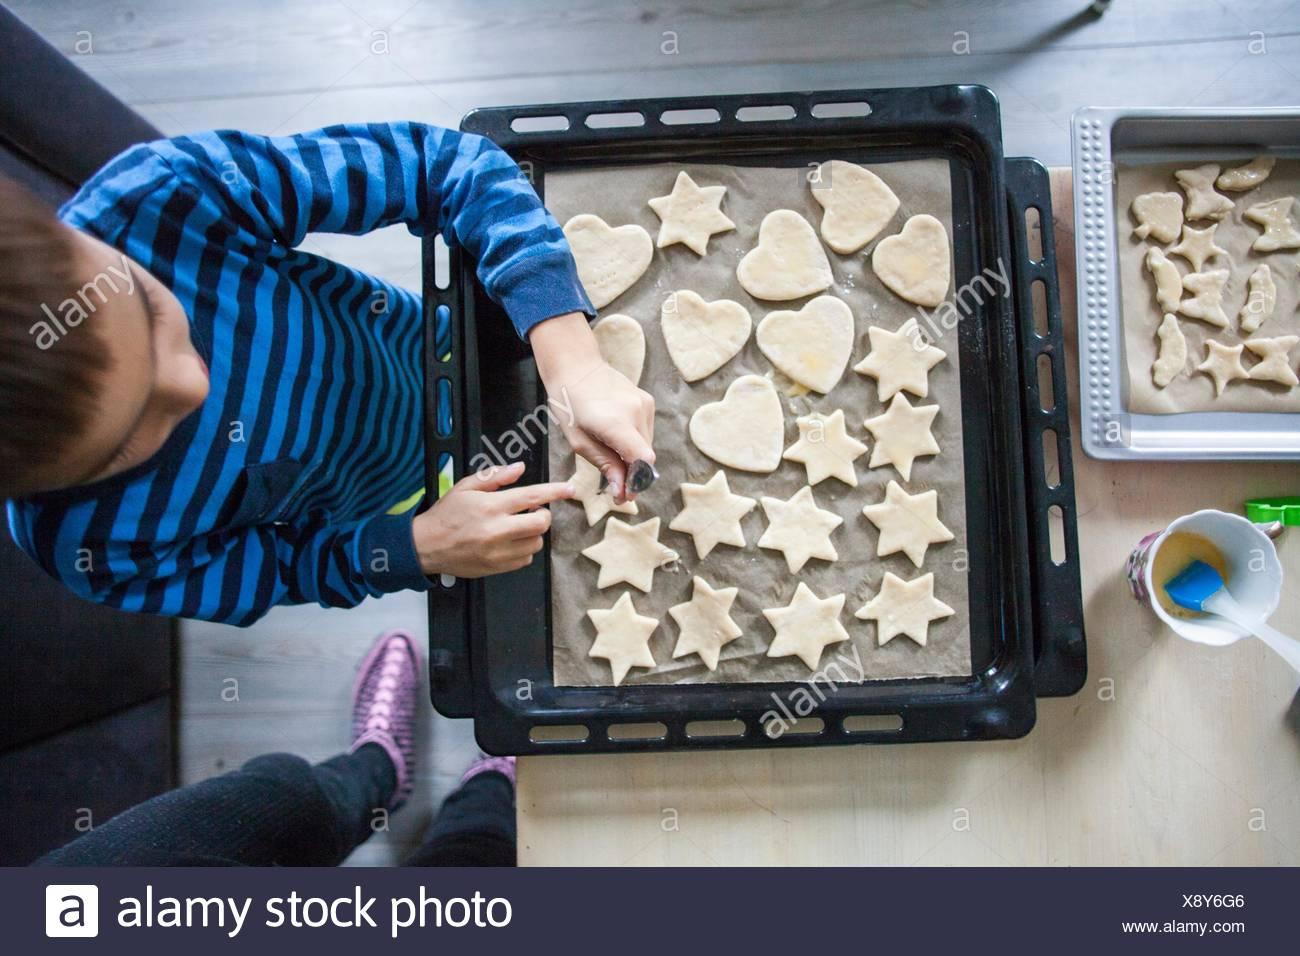 Jeune garçon faisant des cookies, overhead view Photo Stock